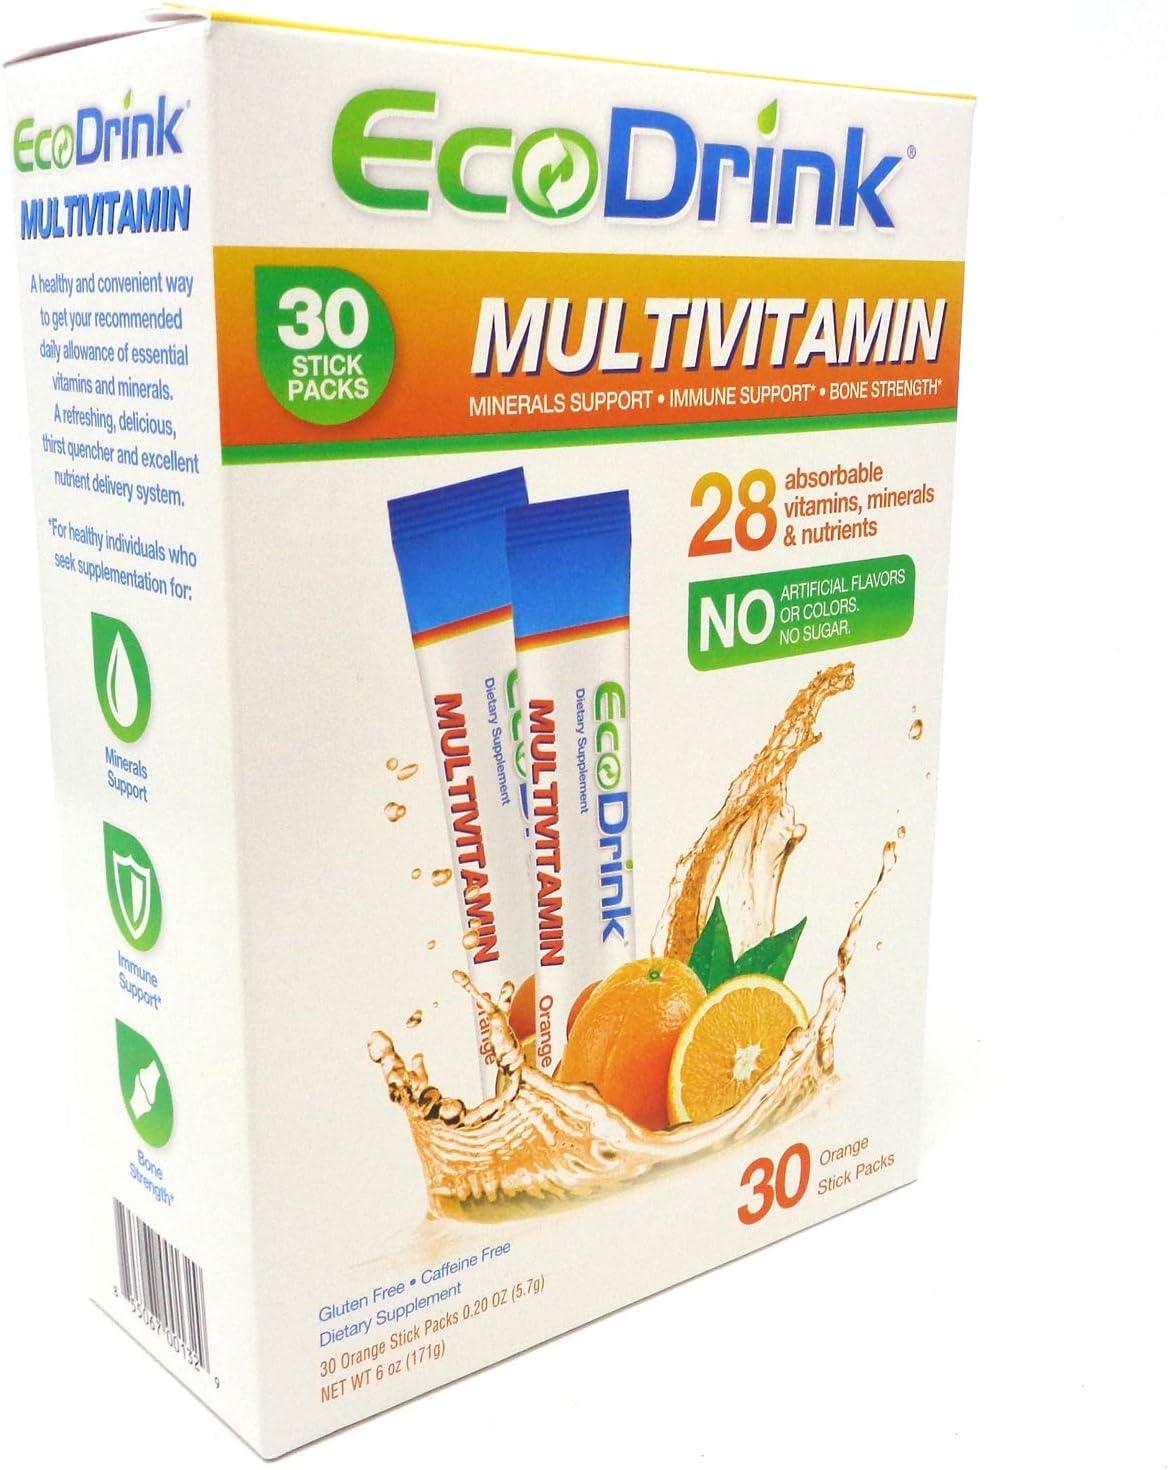 EcoDrink Complete Multivitamin Orange Flavor, 30 Count 2 Pack